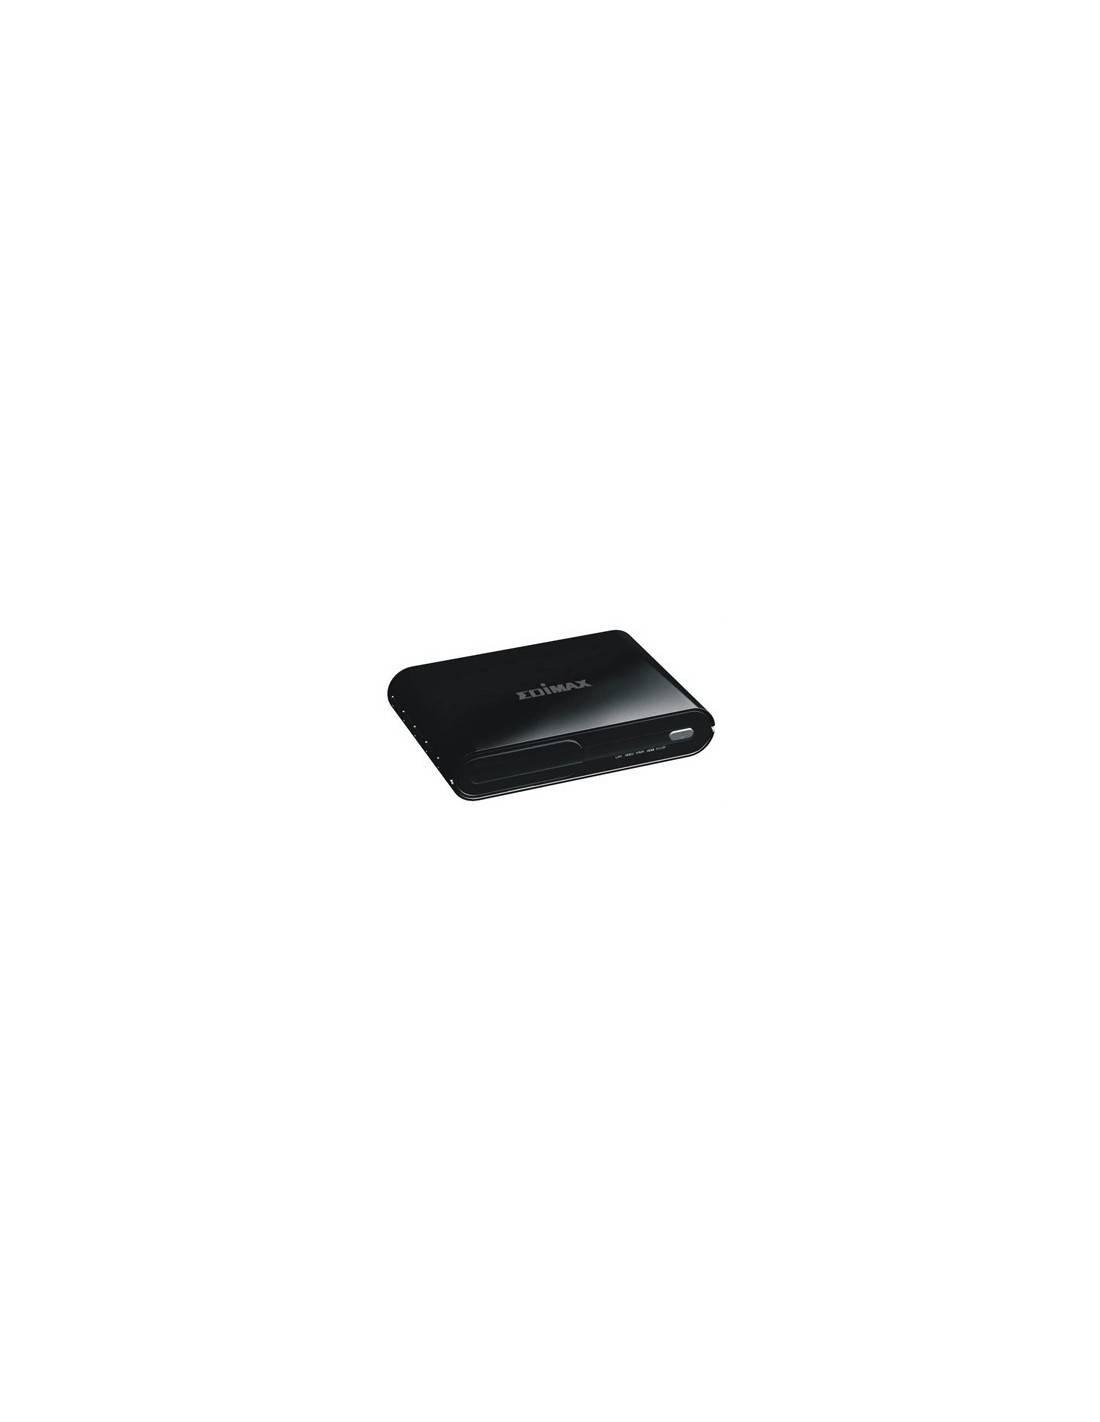 Edimax MA-2000 Digital Network Media Adapter Vista